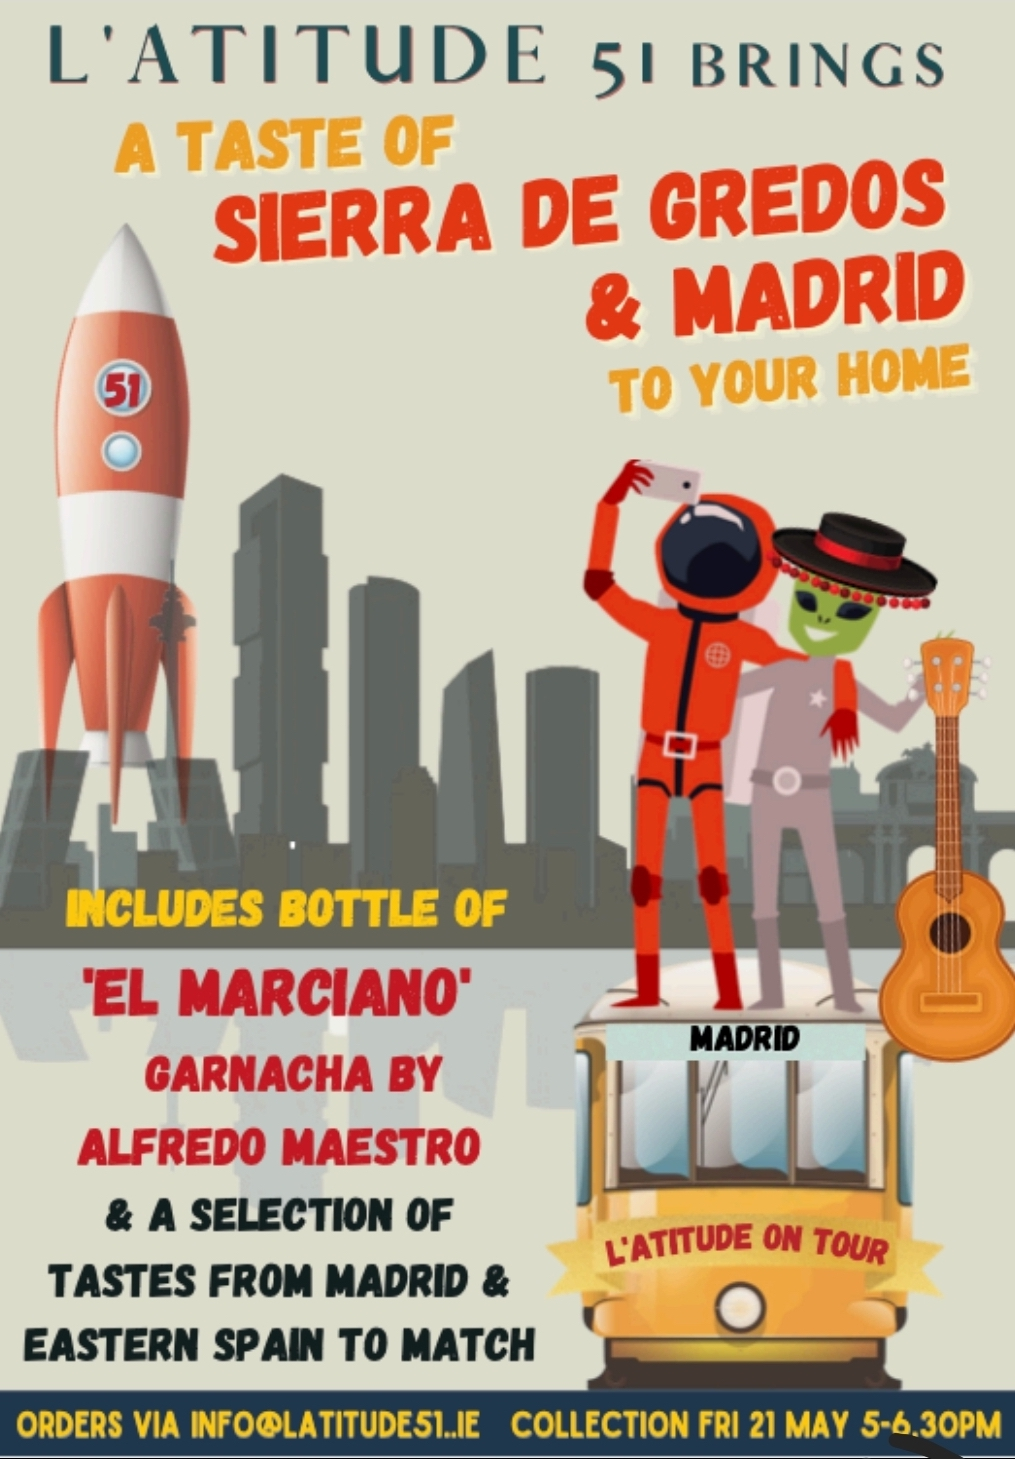 A Taste of Sierra de Gredos / Madrid